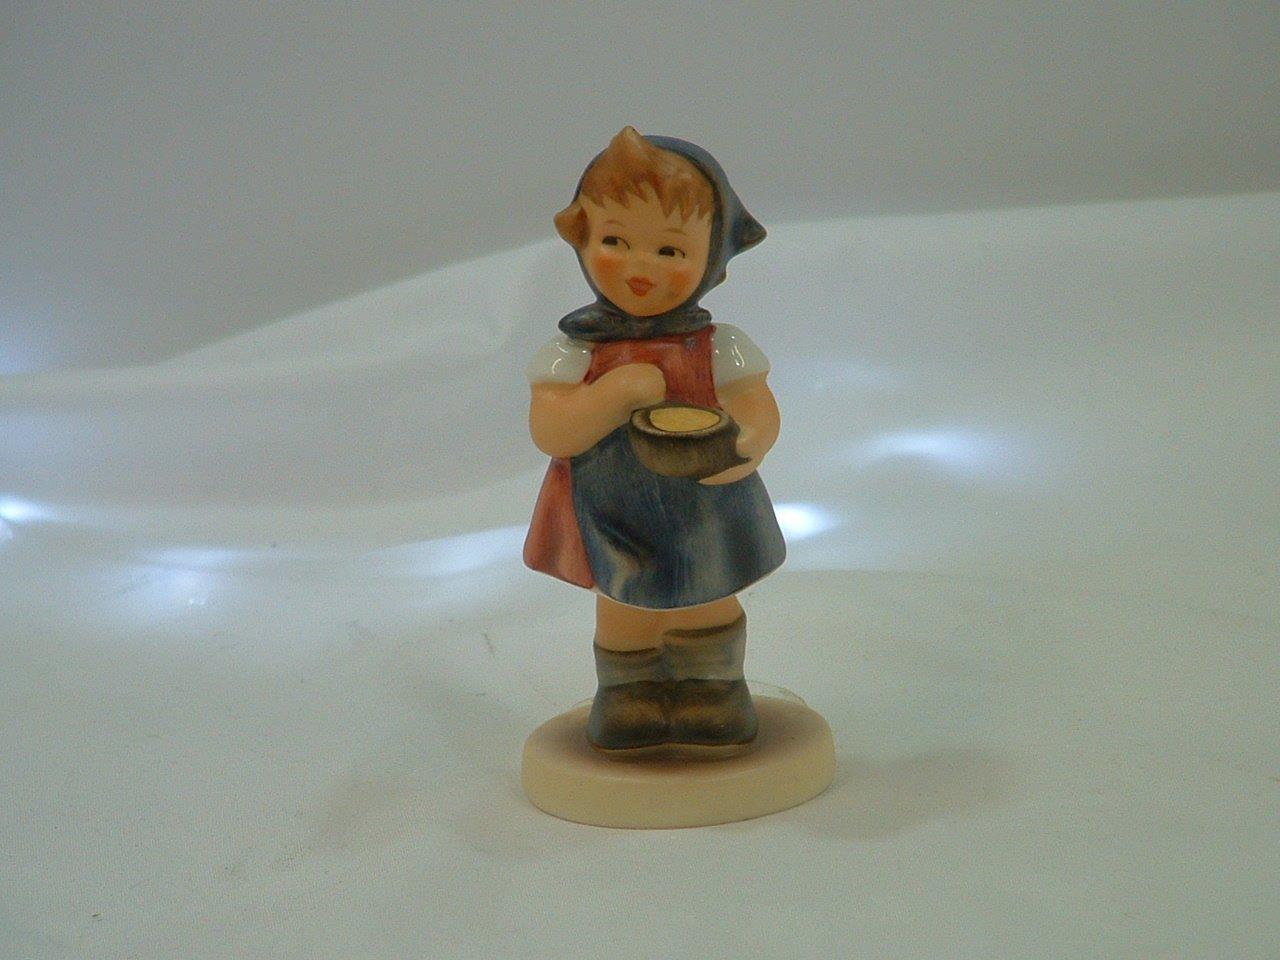 Hummel Goebel Germany From Me To You Figurine